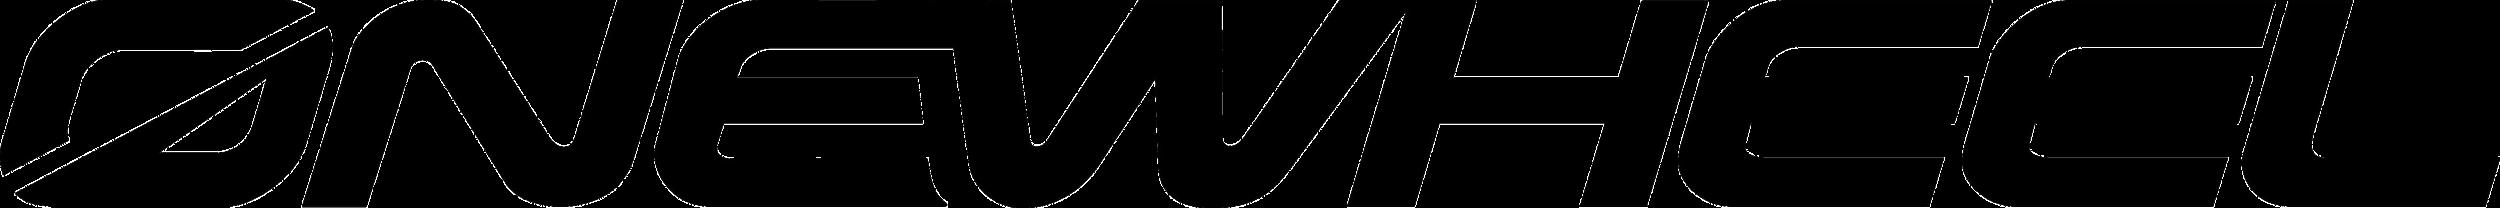 Logo LARGE no background.png